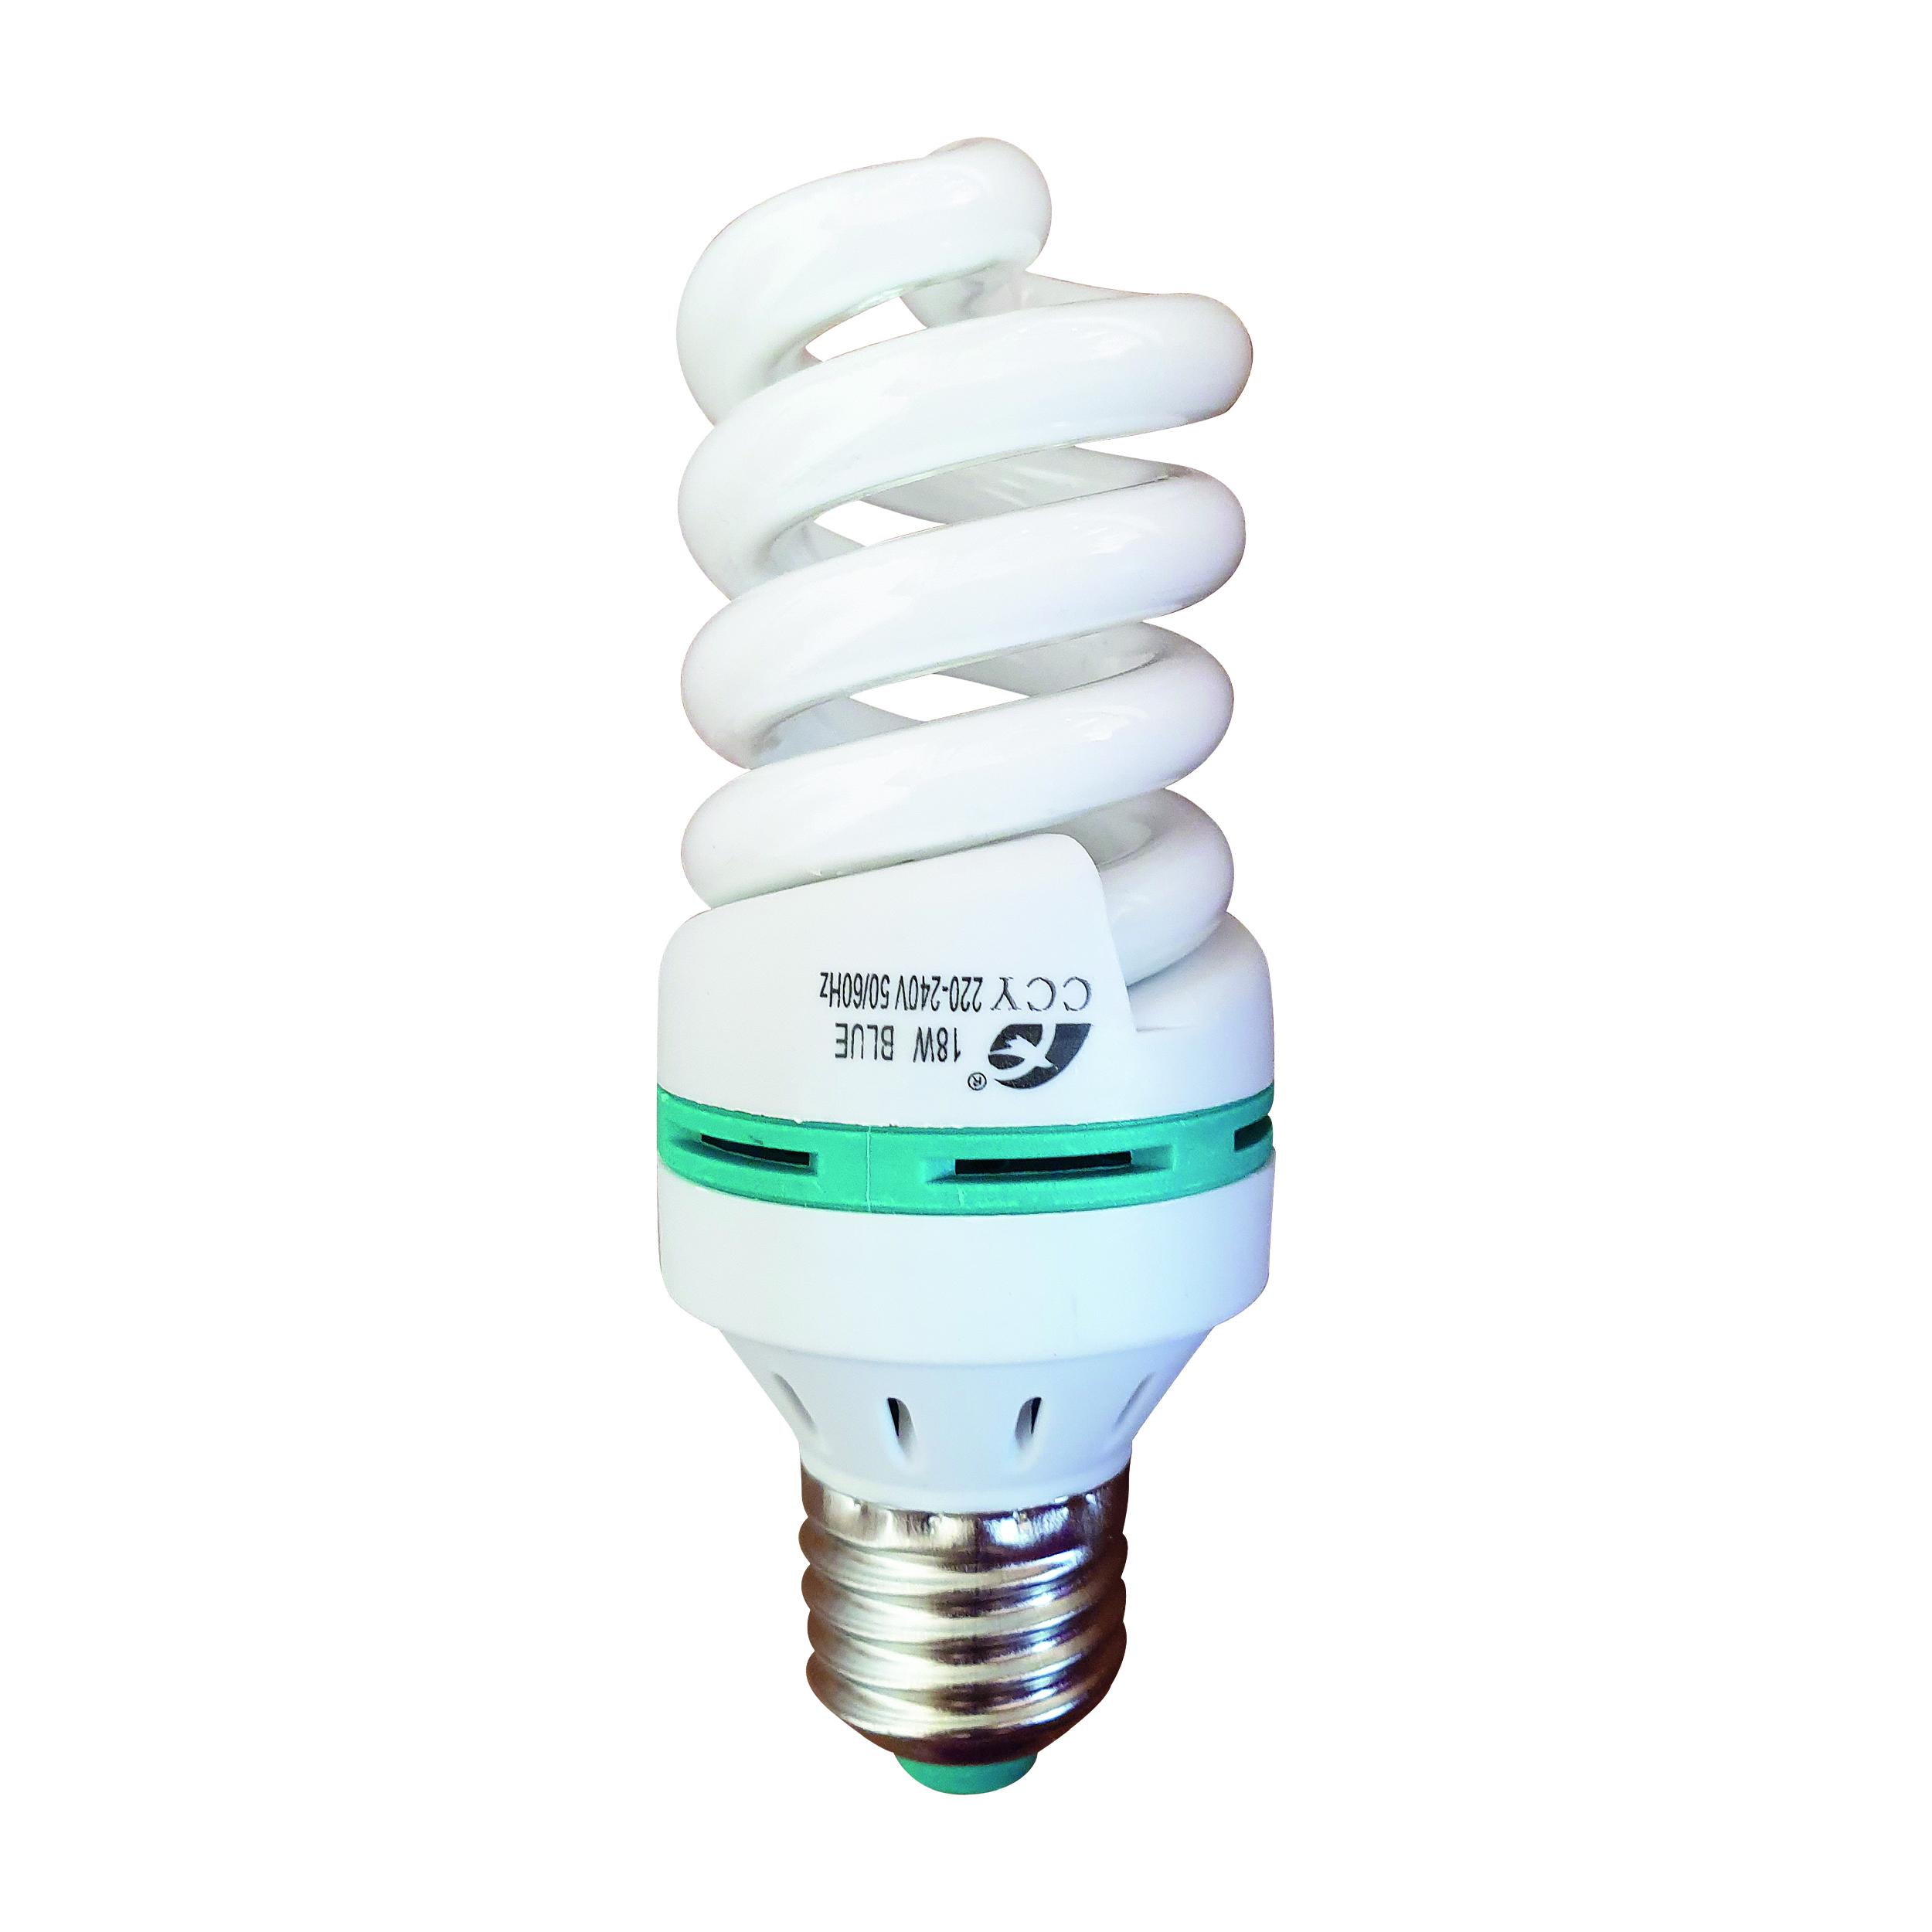 لامپ کم مصرف 18 وات اکانومیک مدل CCY پایه E27